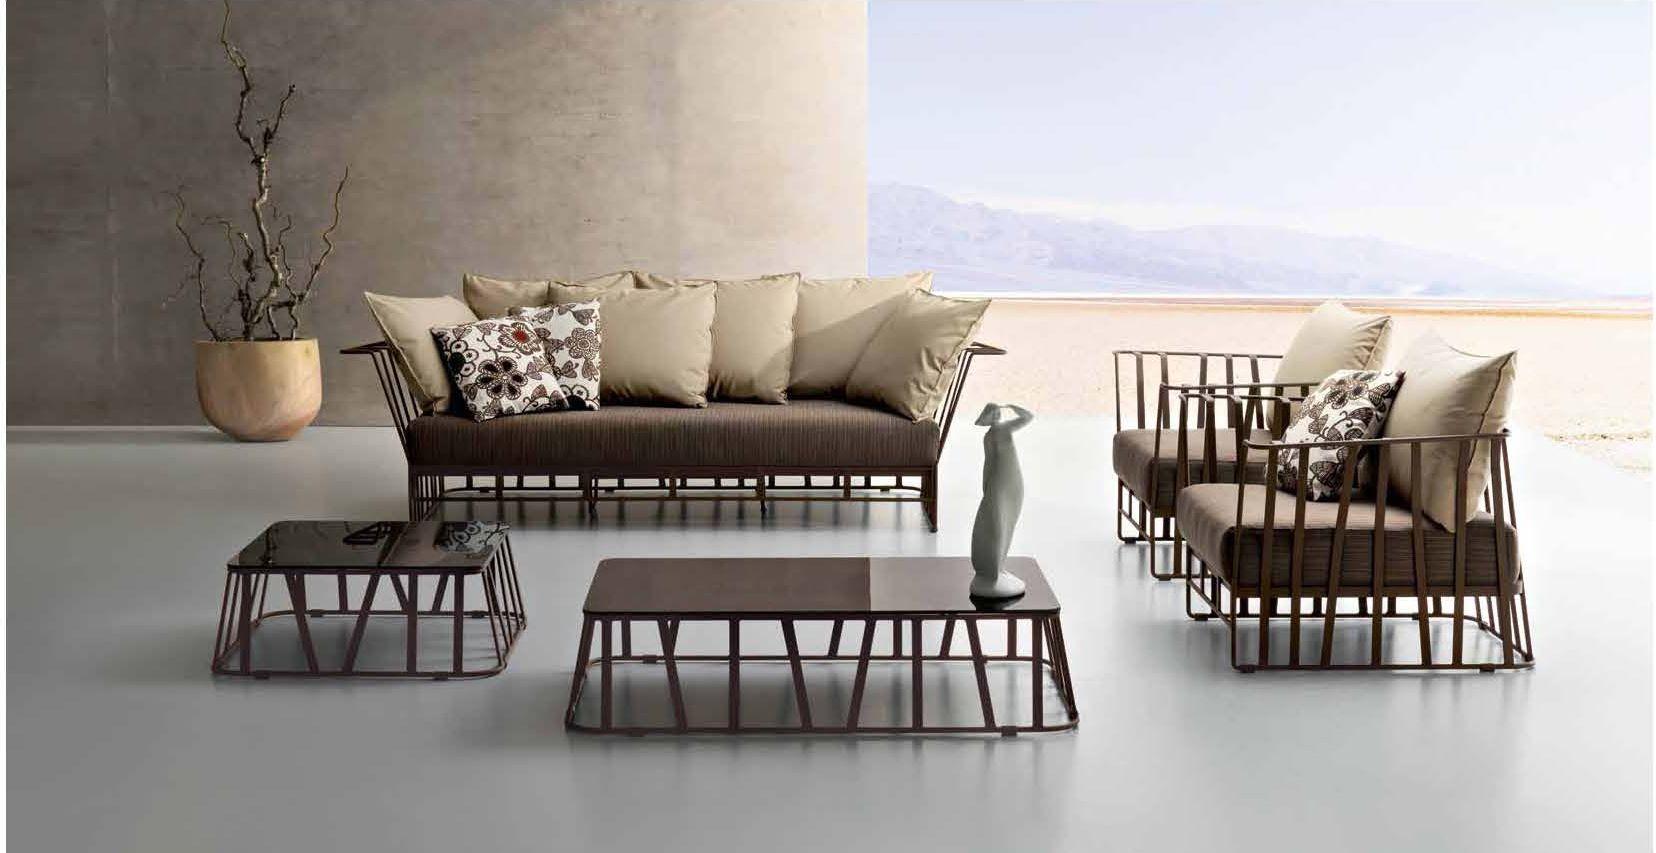 gartenm bel roberti hamptons serie gartenm beldie m bel. Black Bedroom Furniture Sets. Home Design Ideas